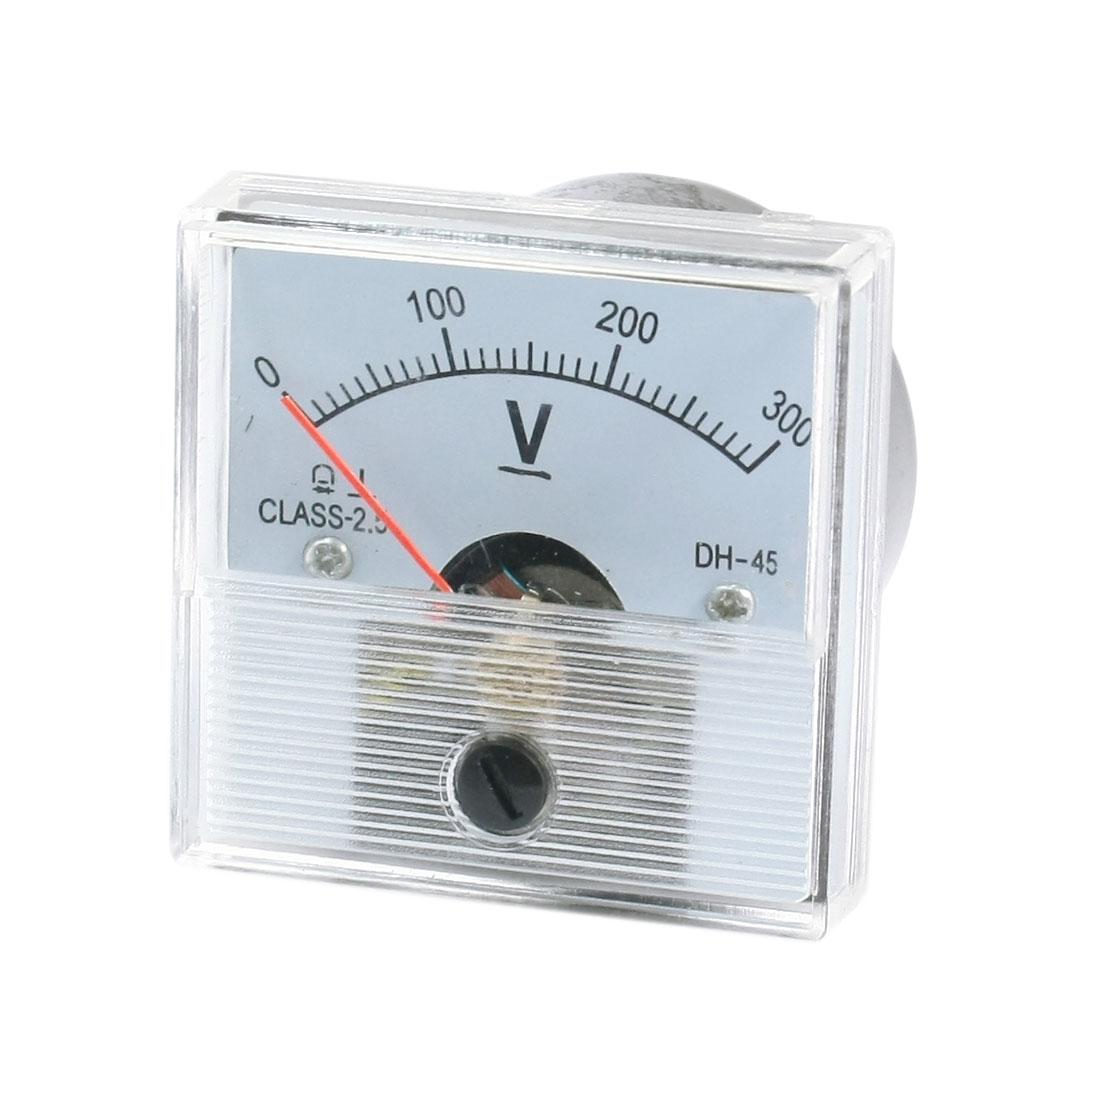 DC 0-300V Arabic Numerals Dial Panel Analog Voltmeter Volt Meter DH-45